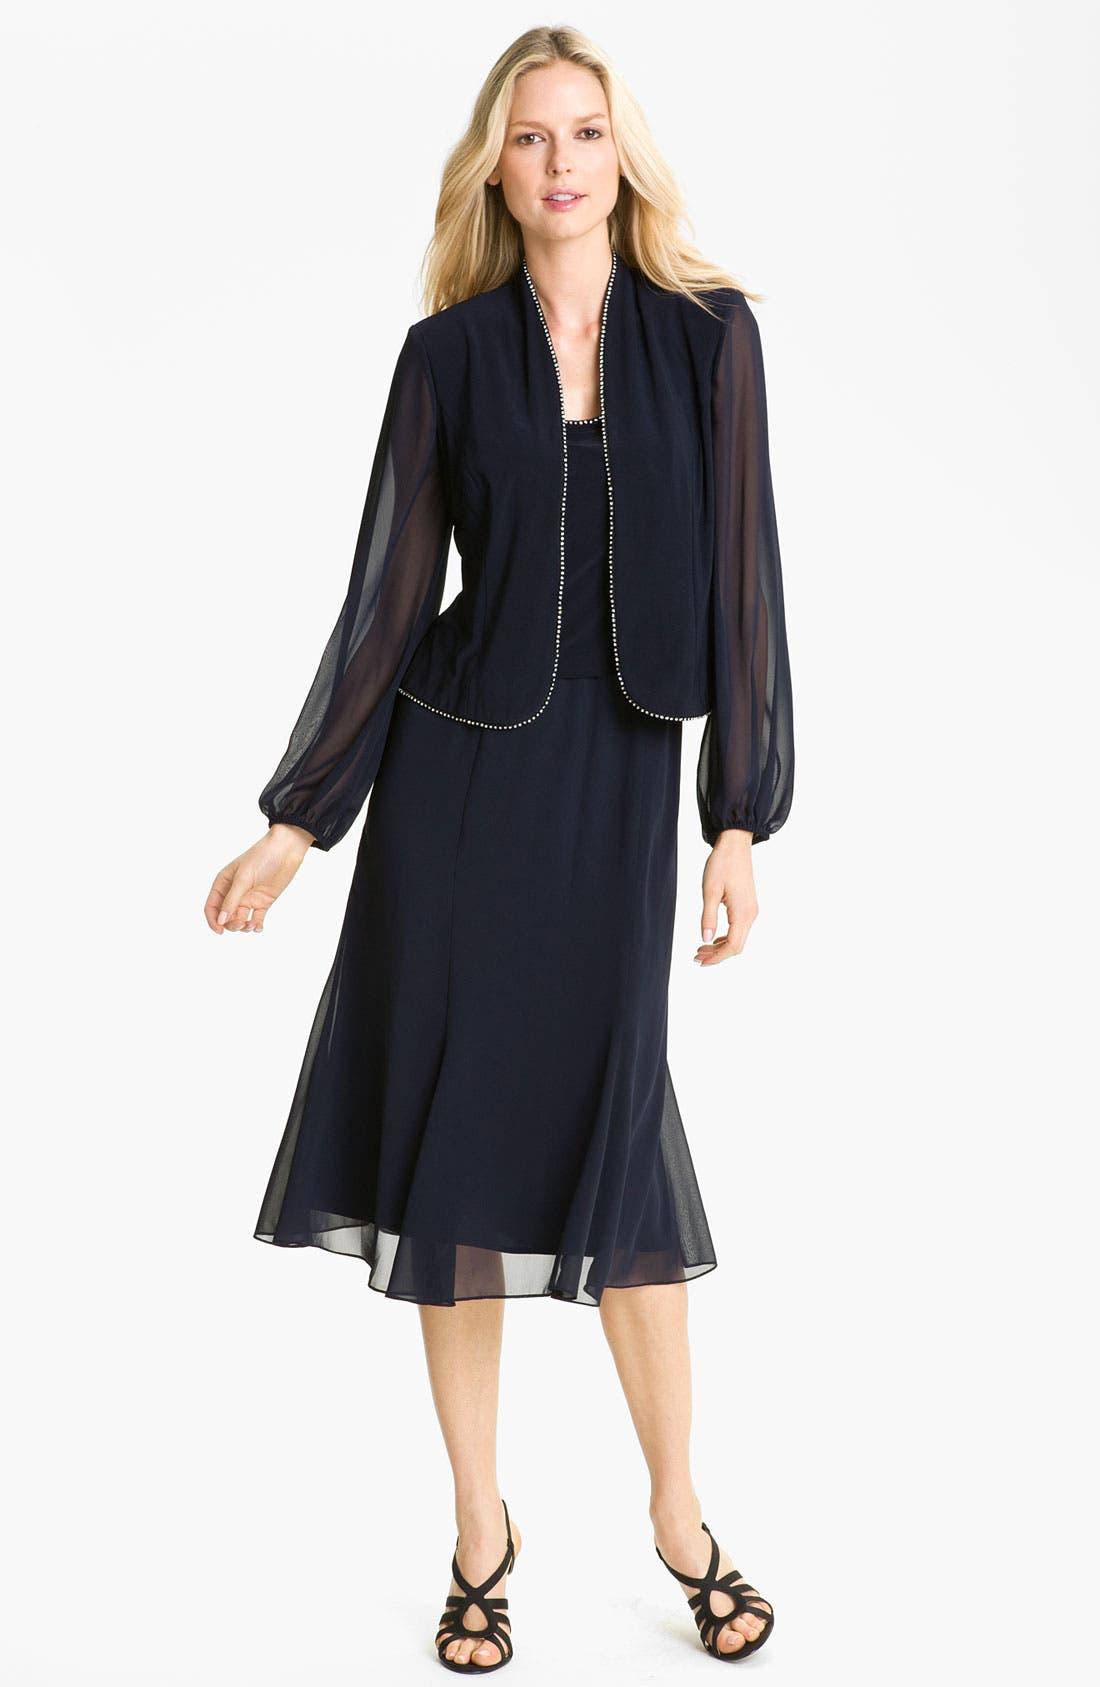 Alternate Image 1 Selected - Alex Evenings Rhinestone Trim Mix Media Dress & Jacket